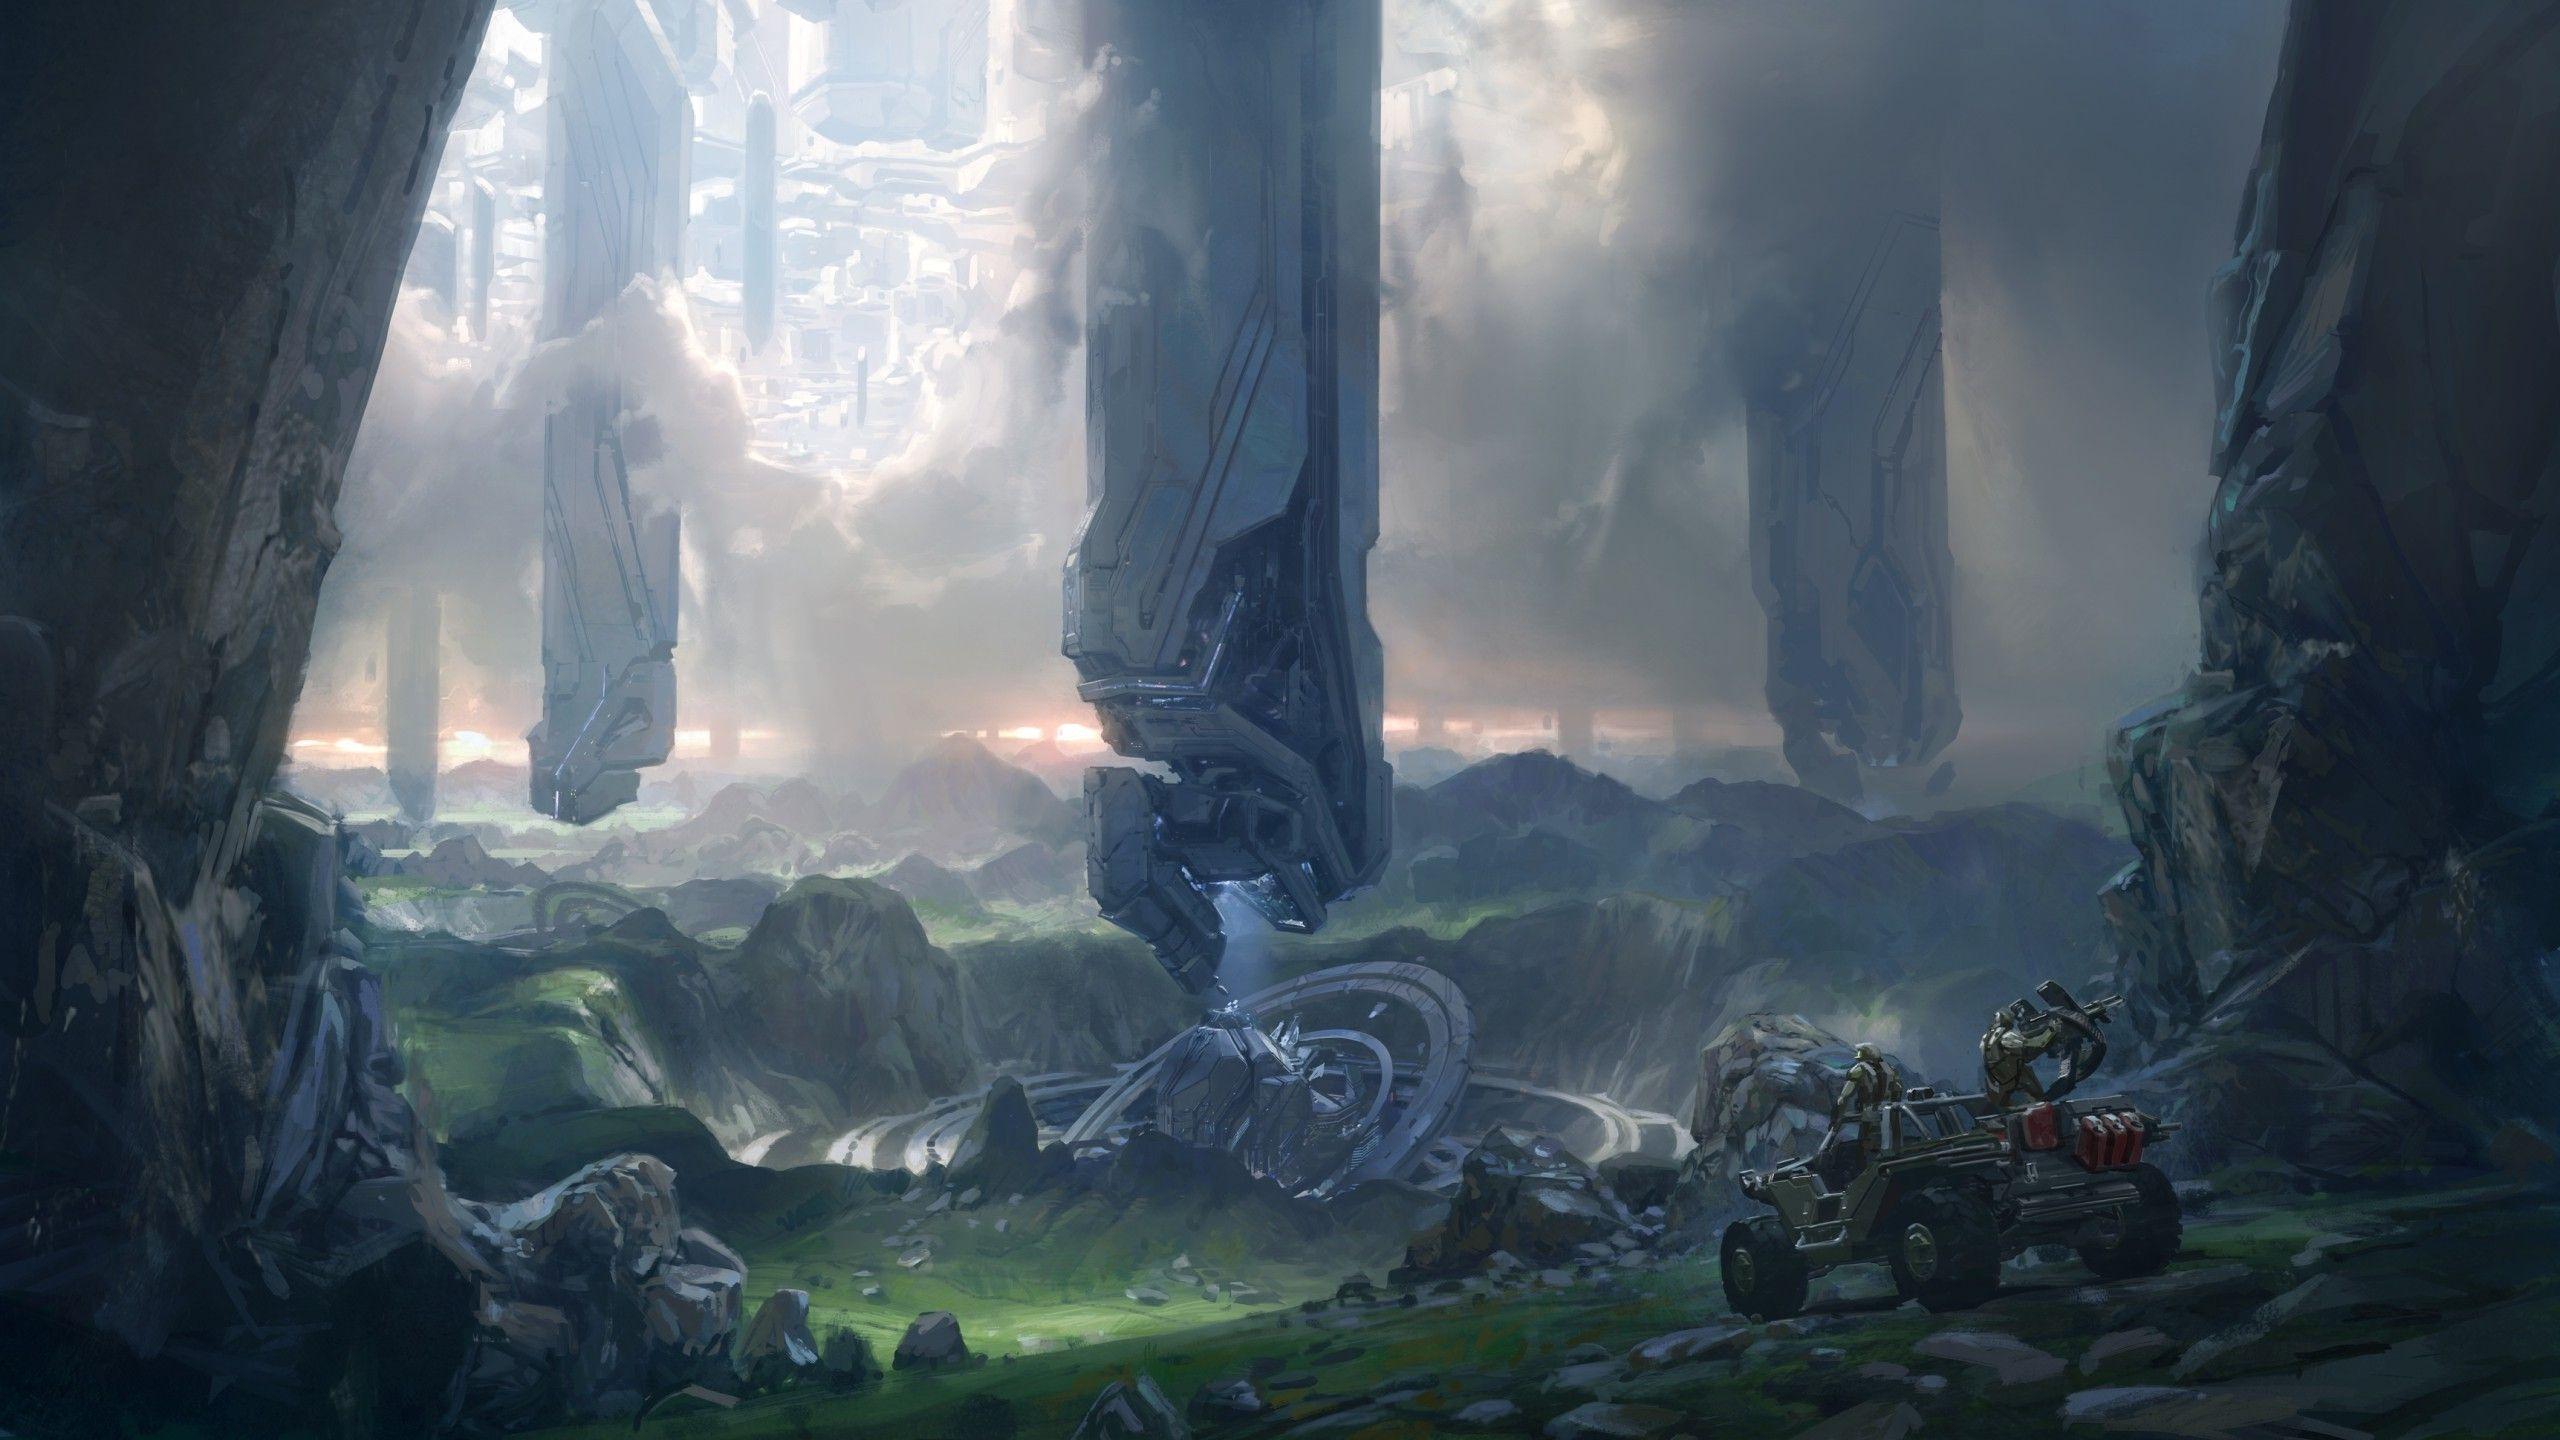 Halo 4 wallpaper 16137 2560x1440